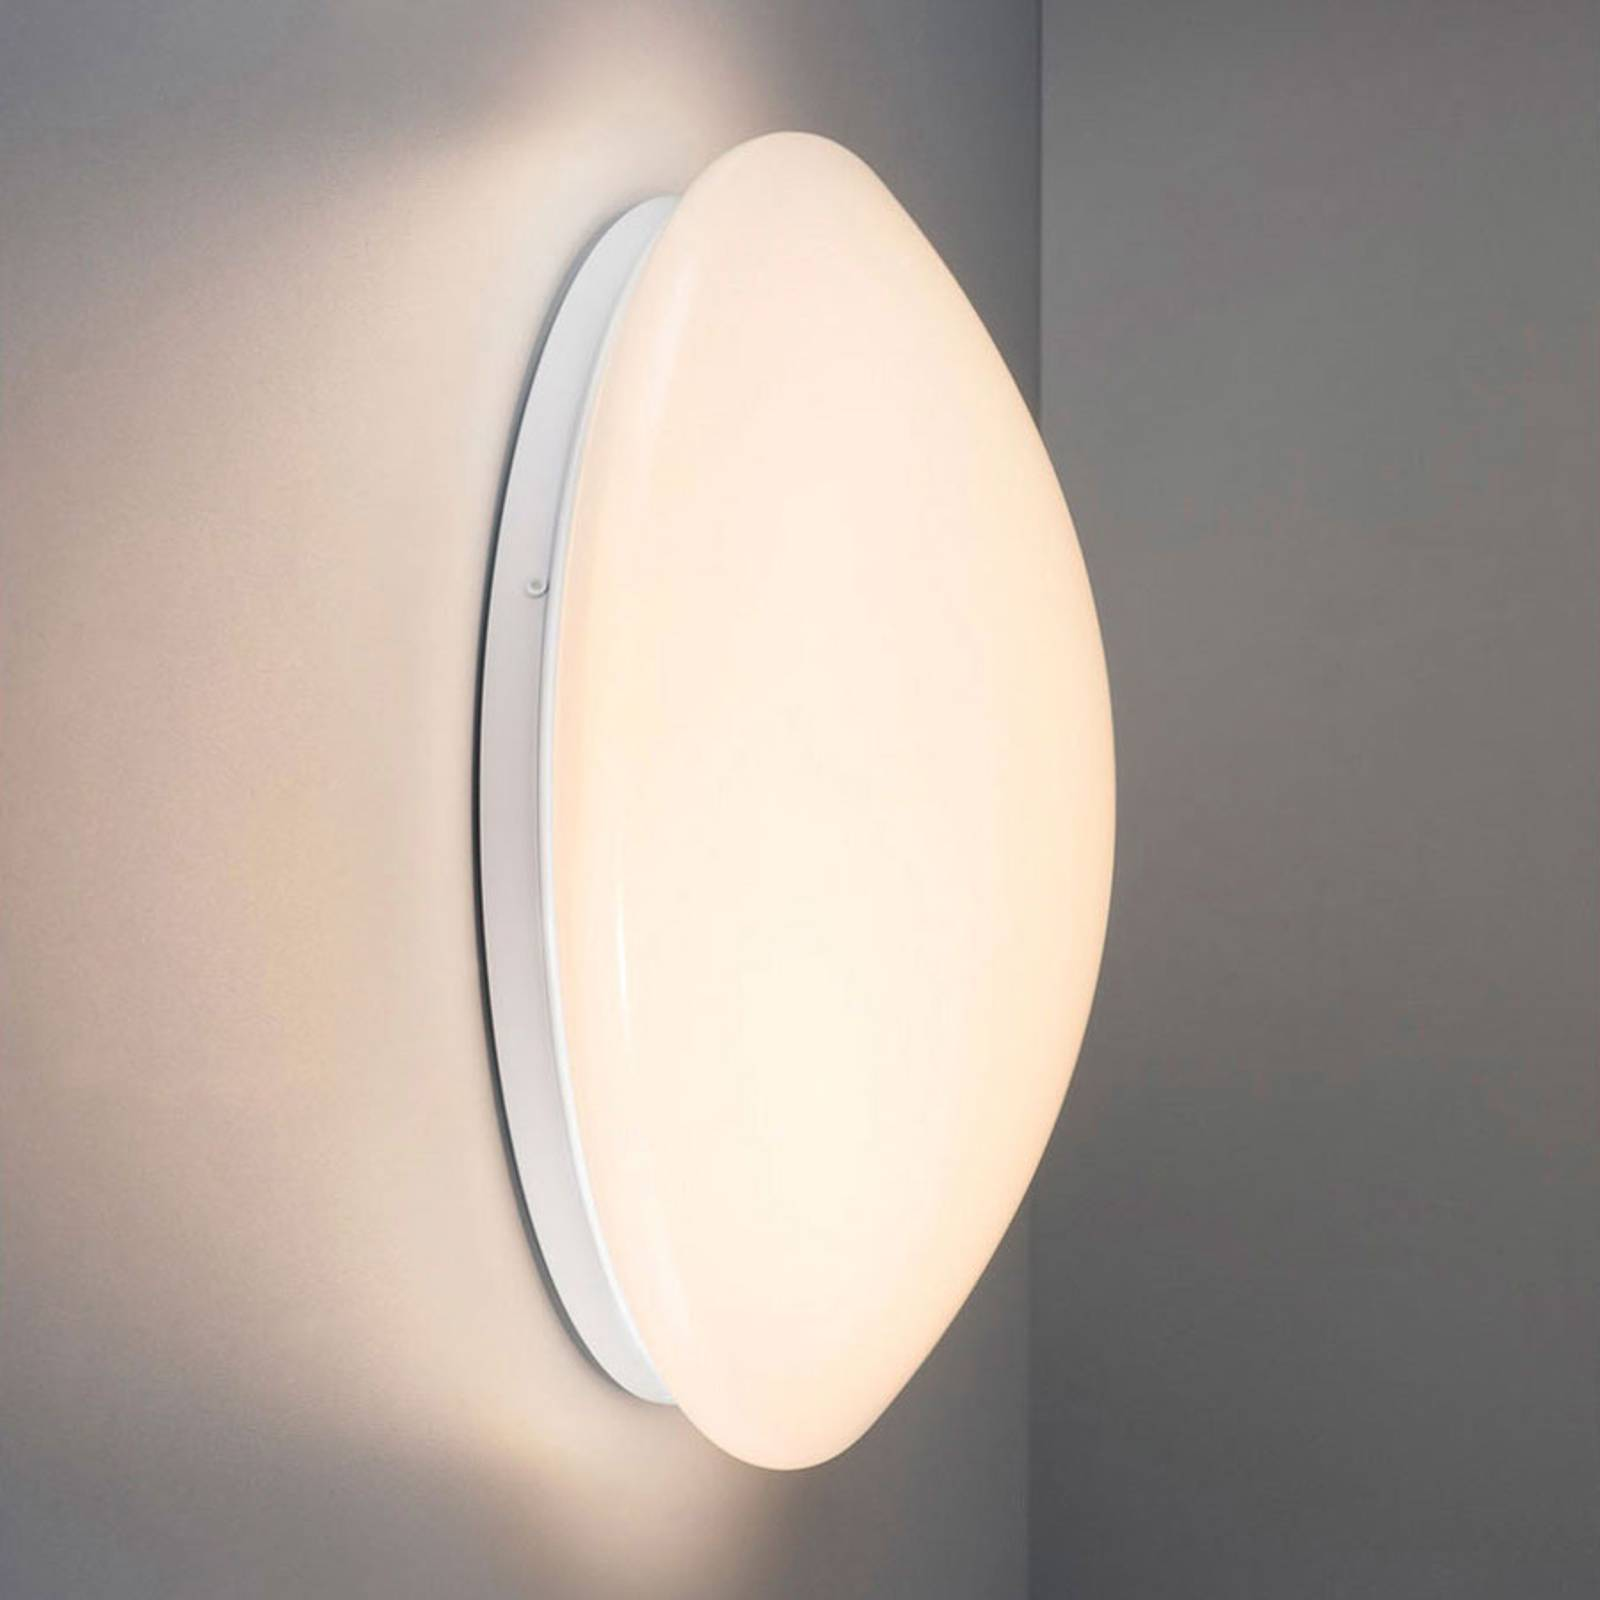 SLV VALETO Lipsy applique LED, Ø 28 cm